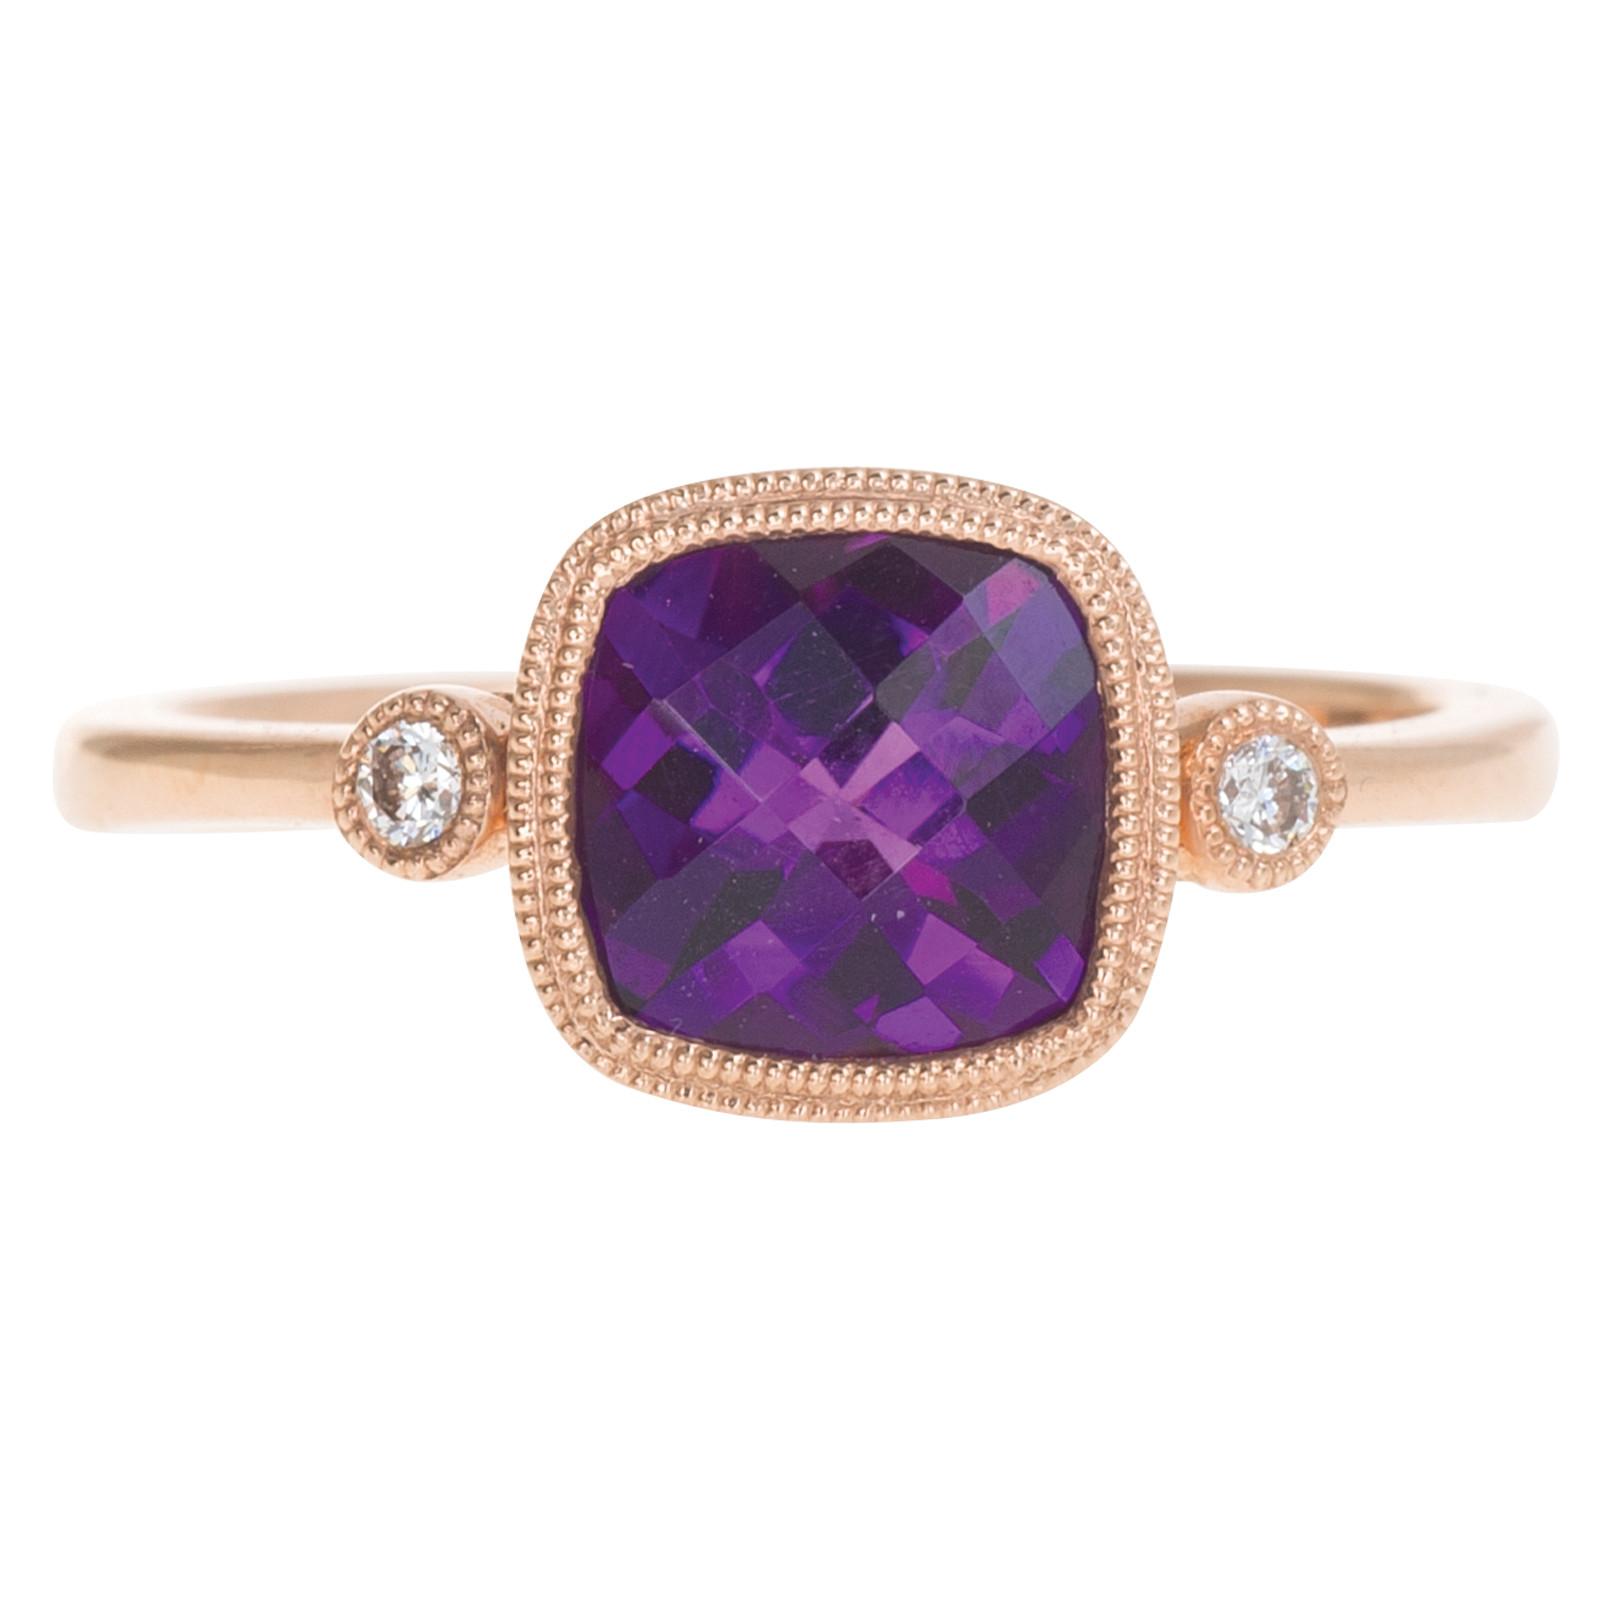 New 1.30 CT Amethyst & Diamond Ring